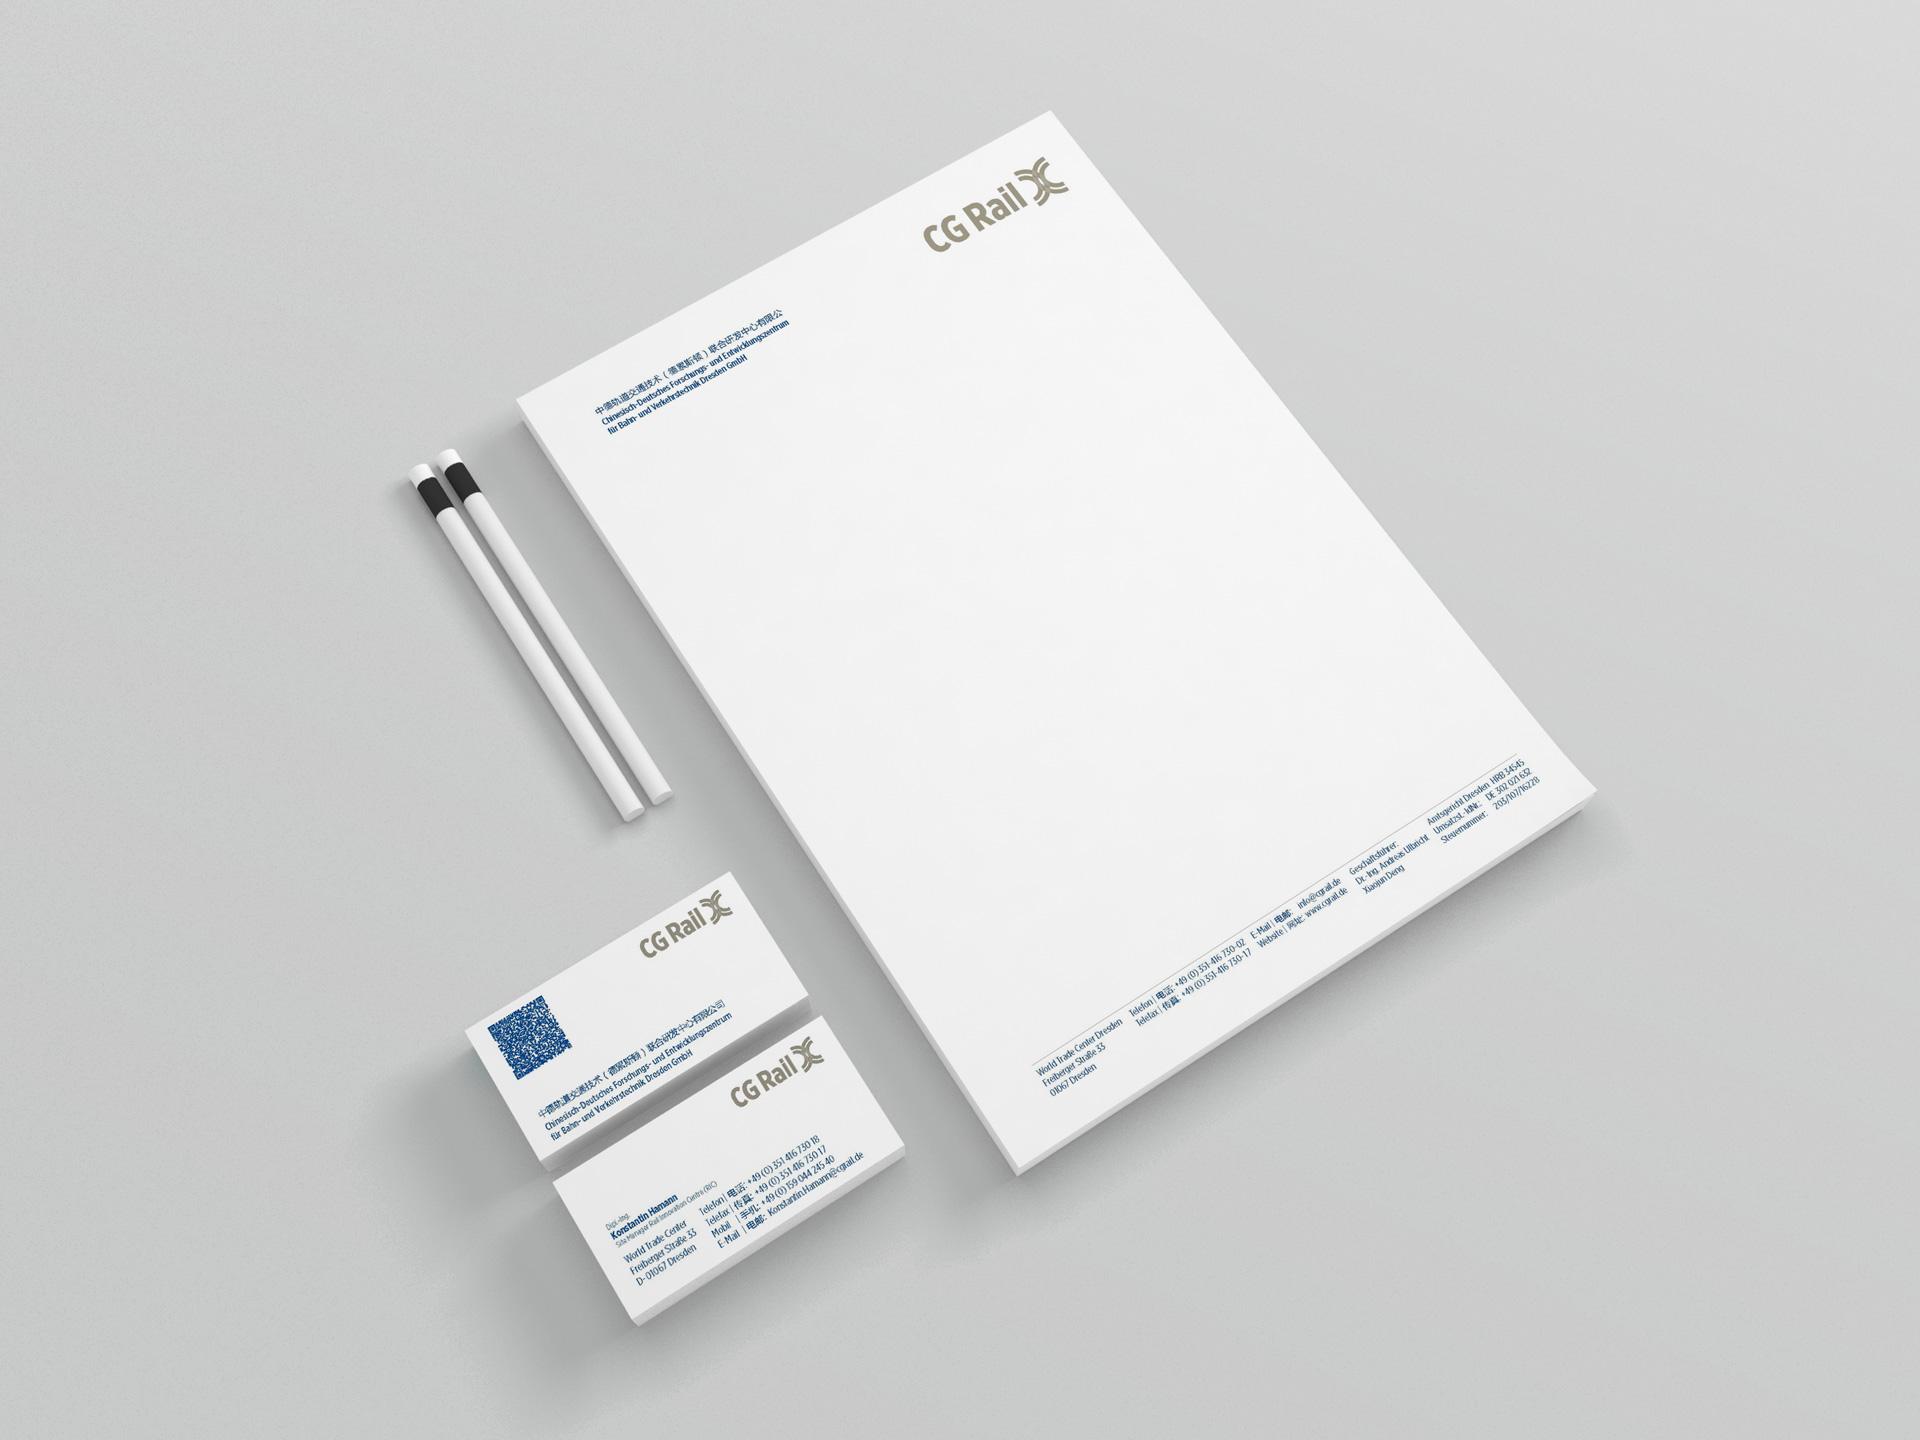 CG Rail GmbH Printmedien Design by facit design